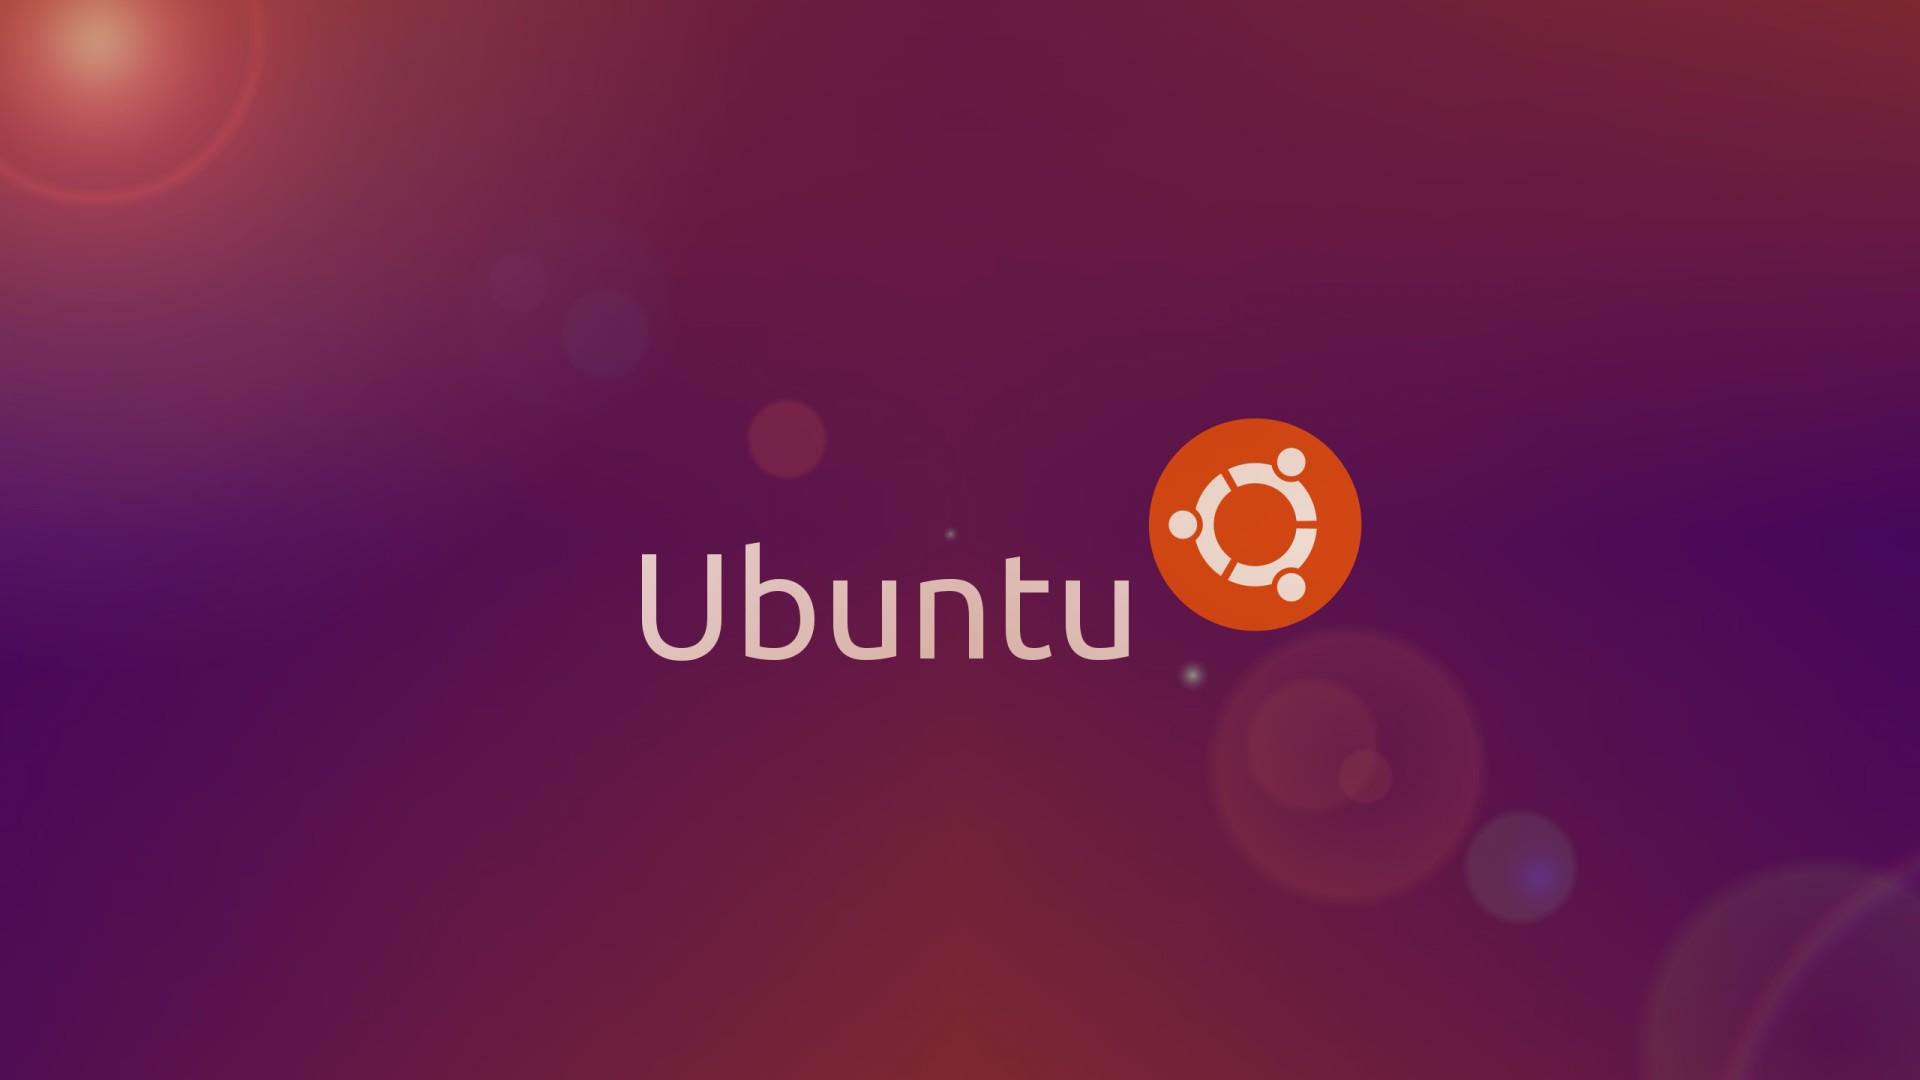 Ubuntu 16.04 – die neue LTS-Version des Betriebssystems Ubuntu Server Wallpaper